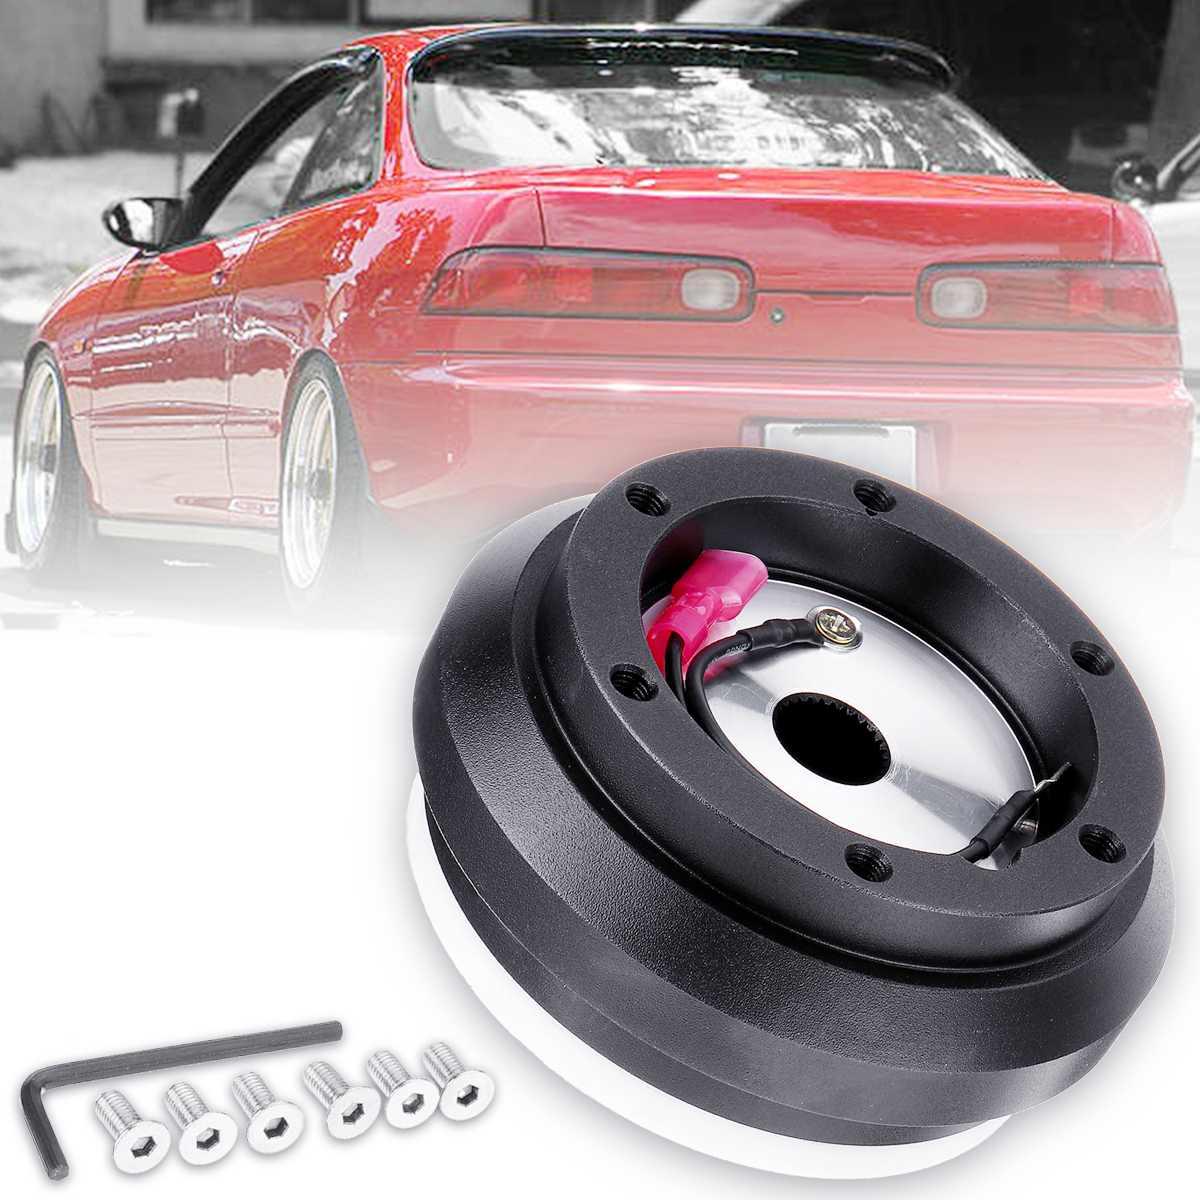 Car & Truck Steering Wheels & Horns Car & Truck Parts Car